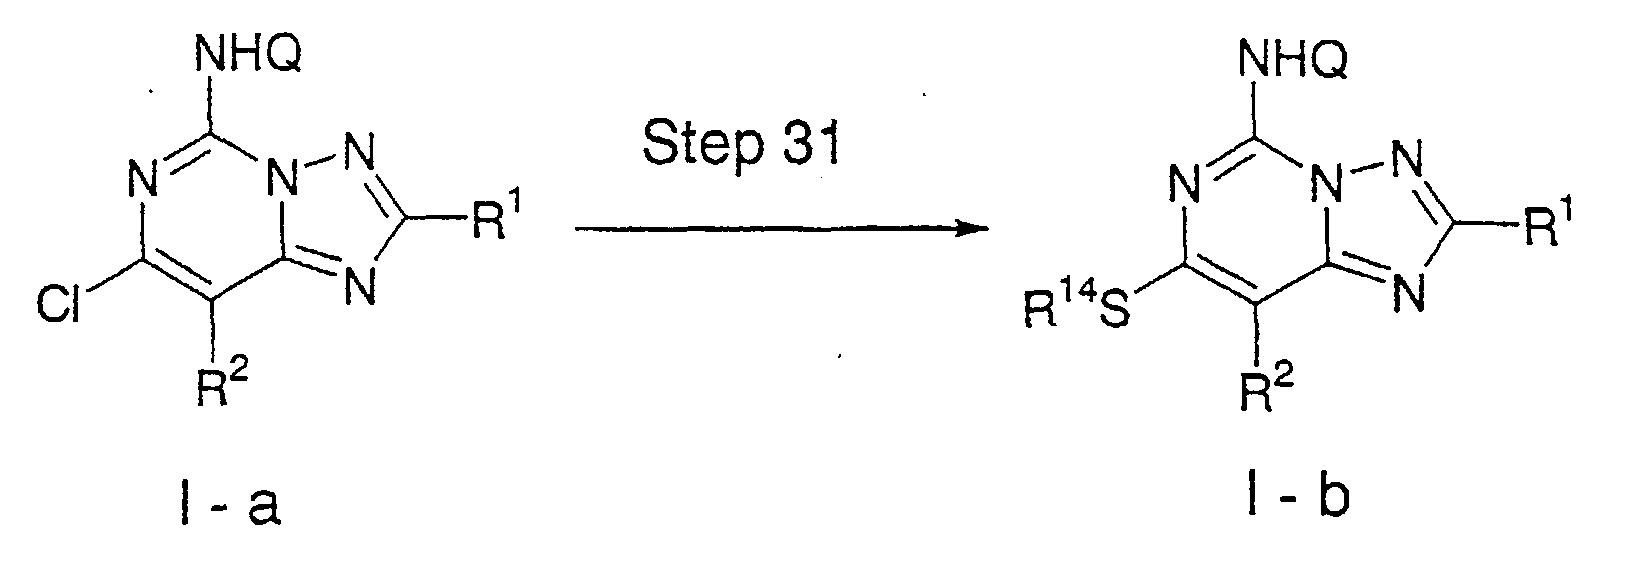 Ep0976753a1 1 2 4 Triazolo 1 5 C Pyrimidine Derivatives